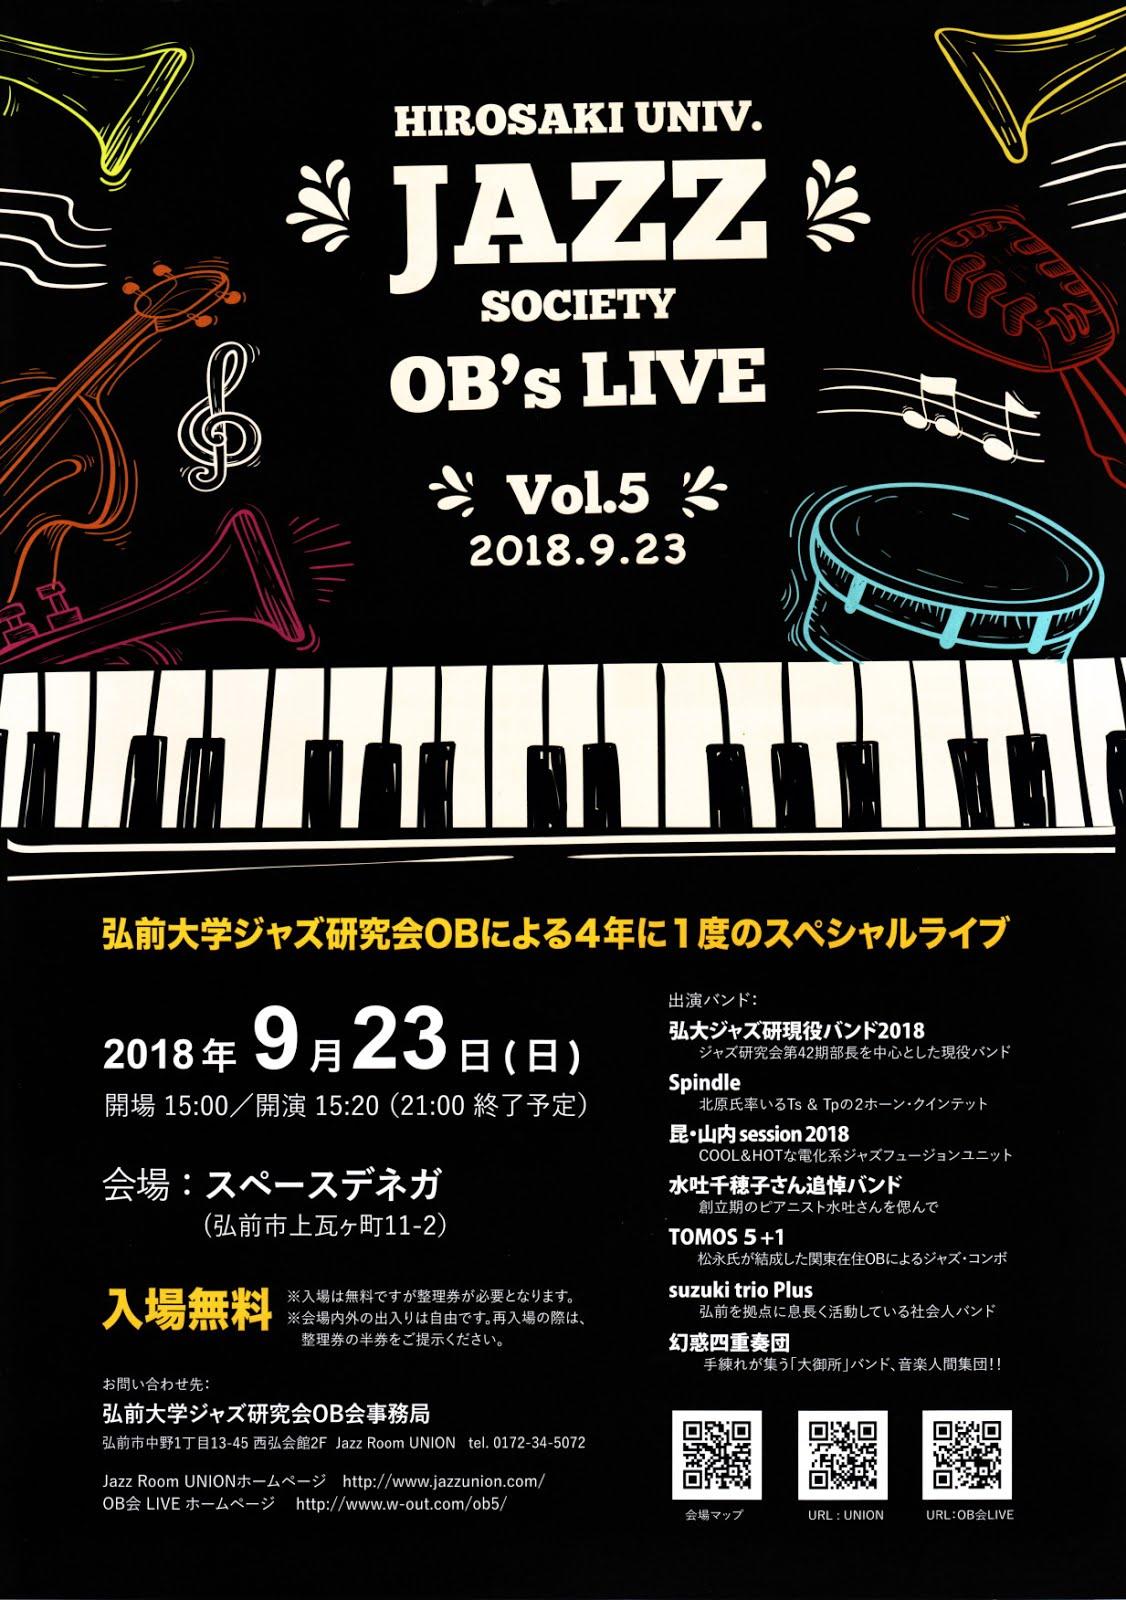 HIROSAKI UNIV. JAZZ SOCIETY OB's LIVE Vol.5